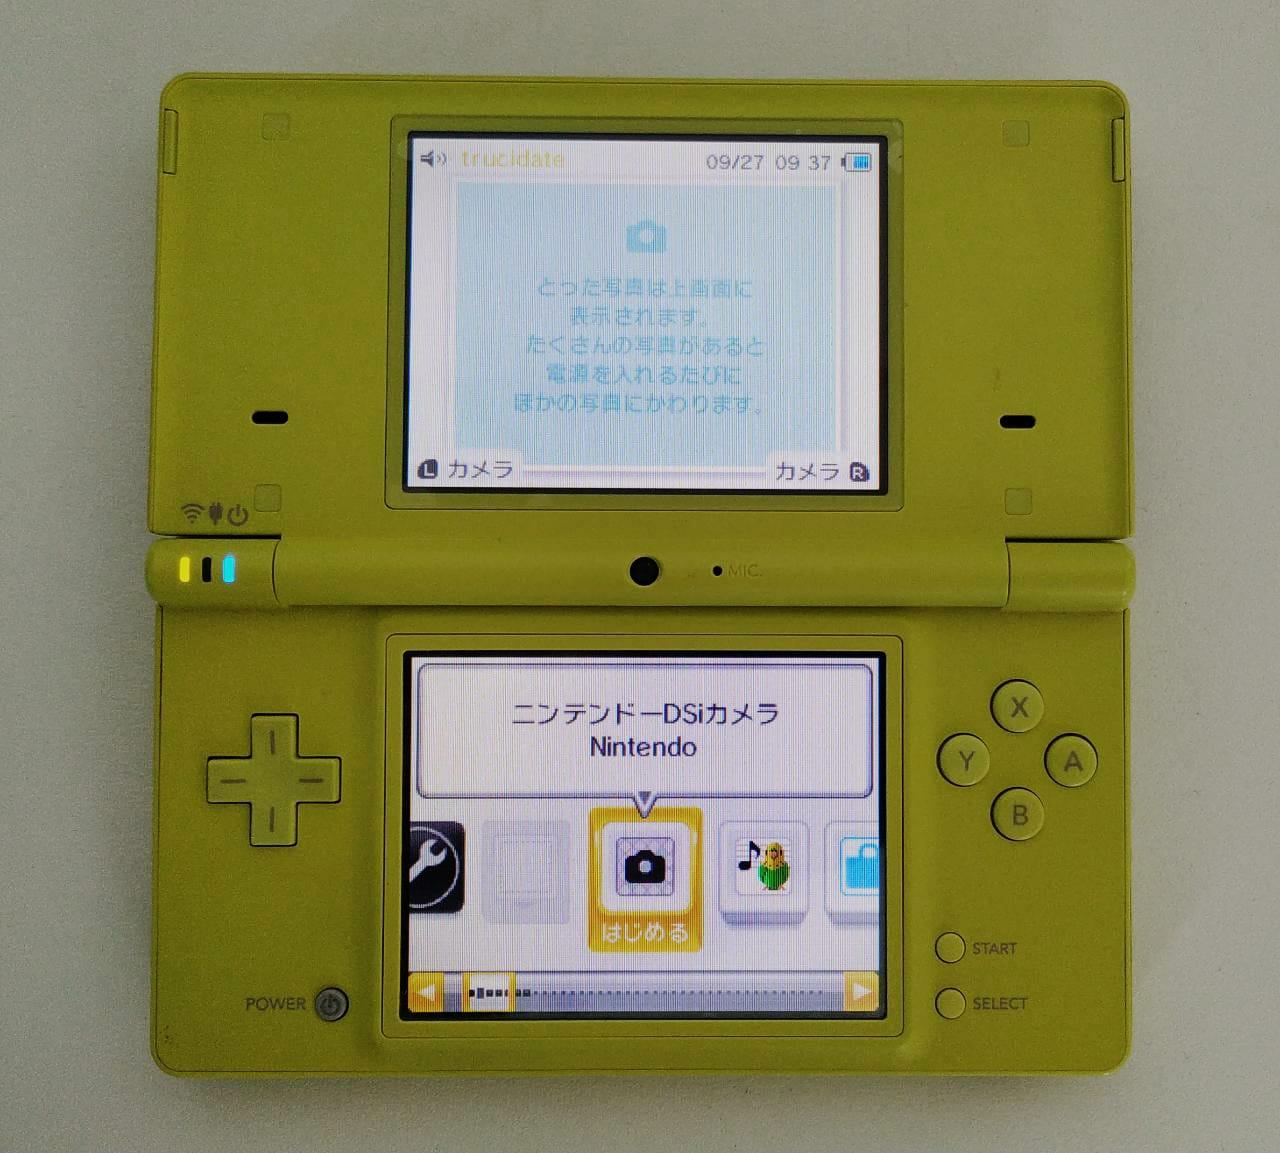 Console Nintendo Dsi - JAPONÊS - Usado